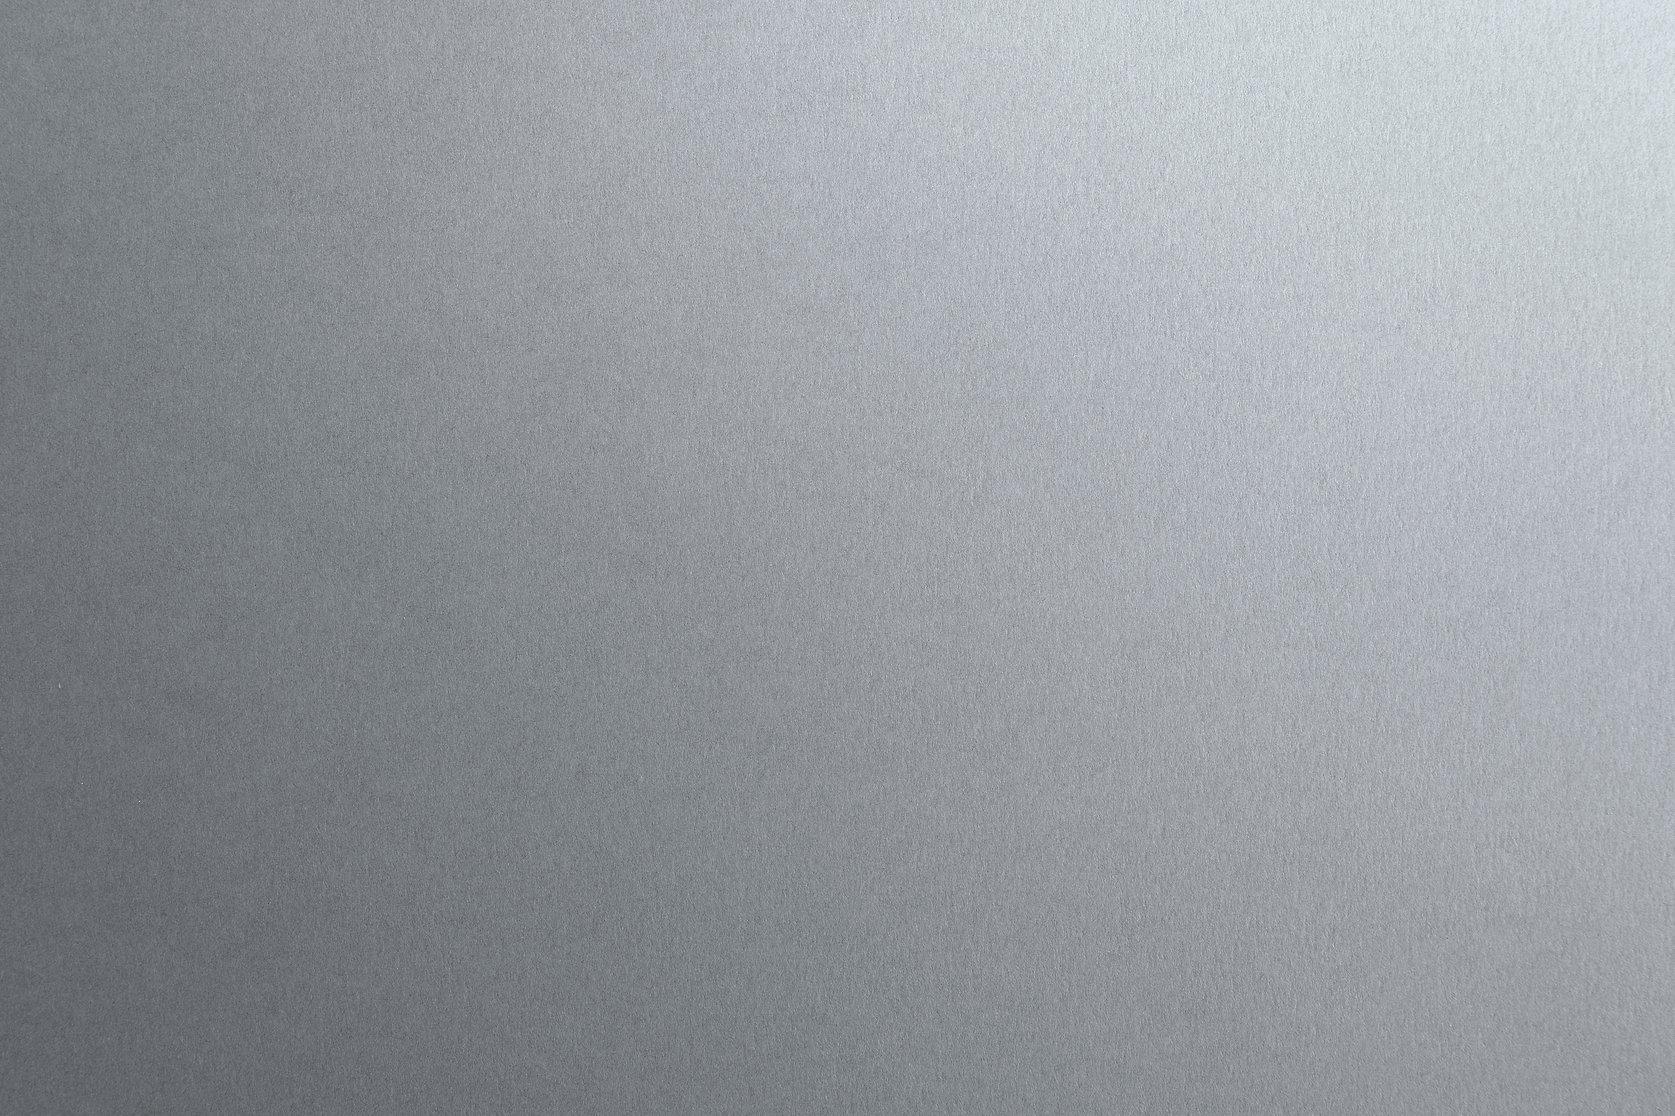 gray-concrete-textured-wall.jpg